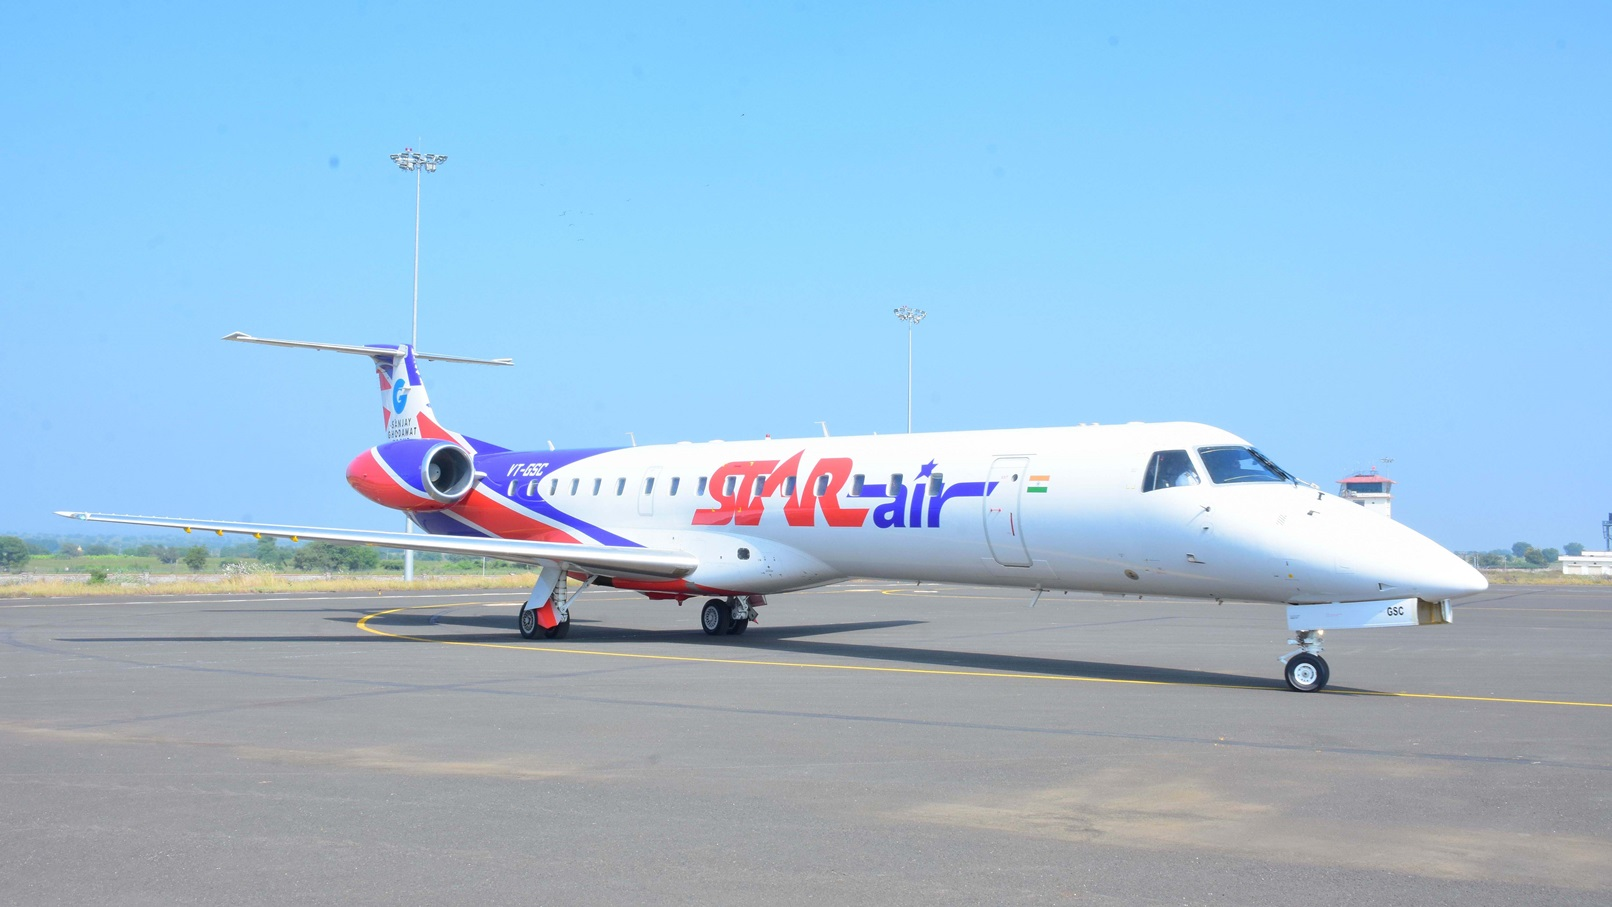 Star Air flights to connect Jamnagar with Bengaluru and Hyderabad